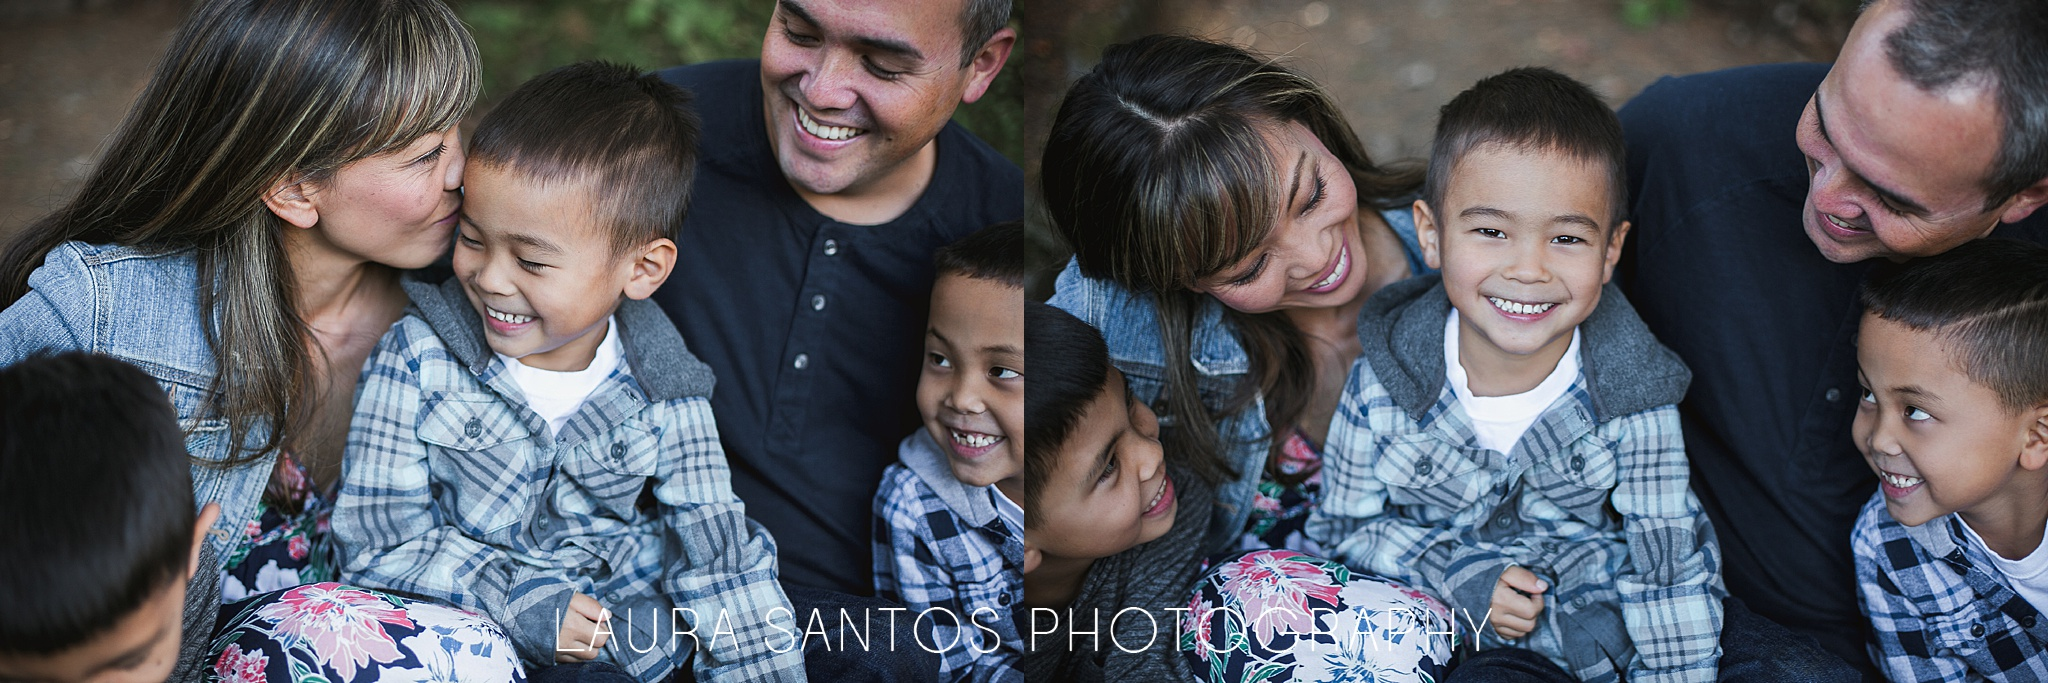 Laura Santos Photography Portland Oregon Family Photographer_0743.jpg